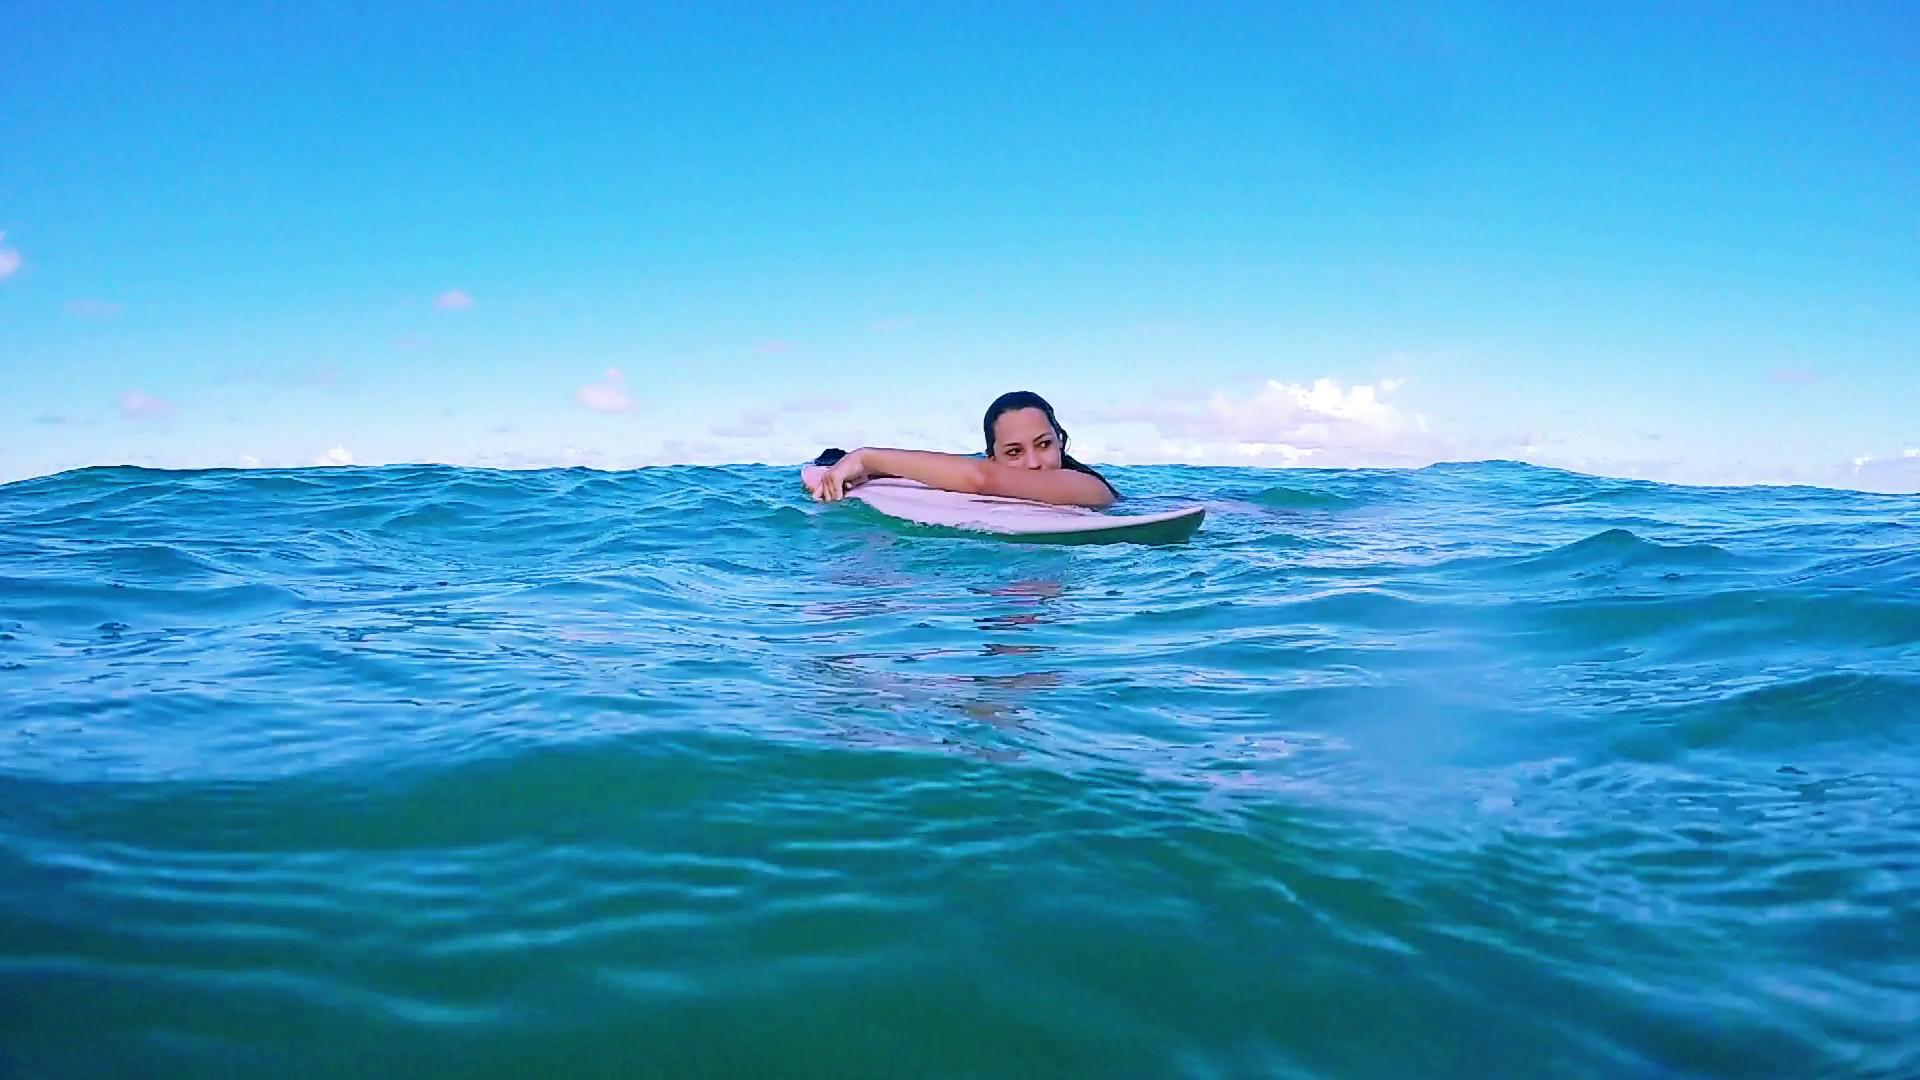 Surfboard floating photo